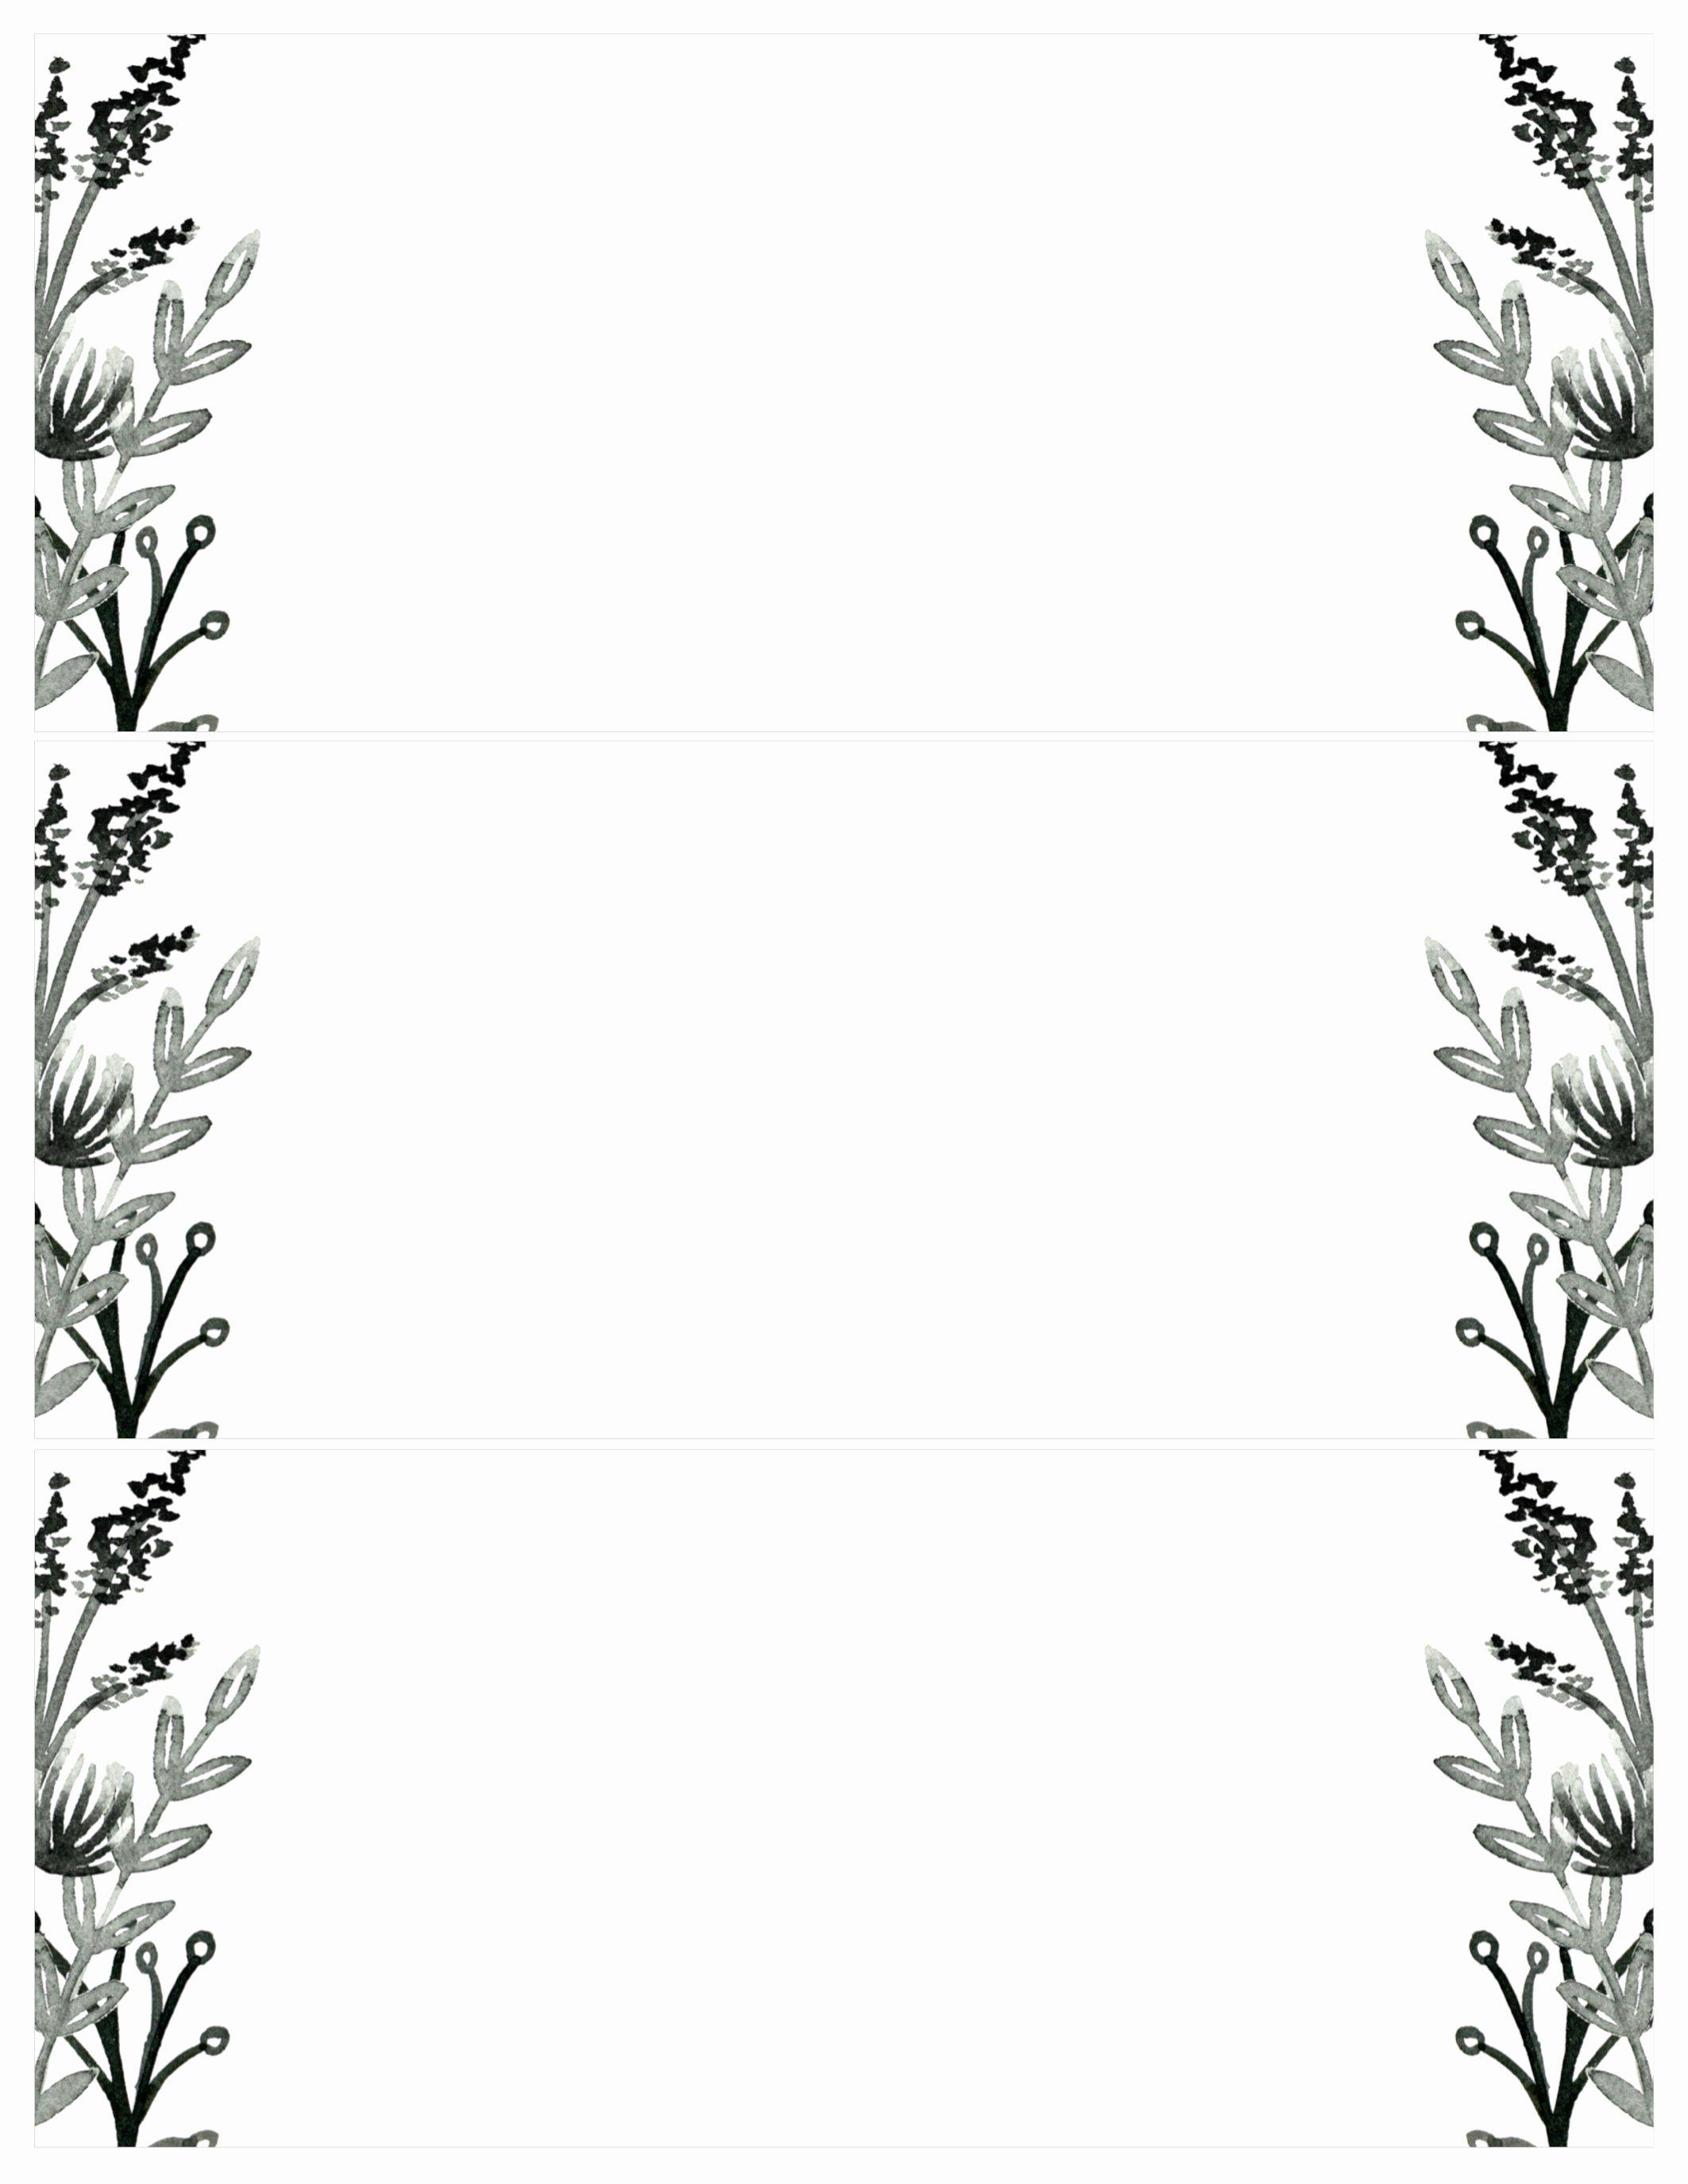 Black White Flowers Invitations Templates Free Printable